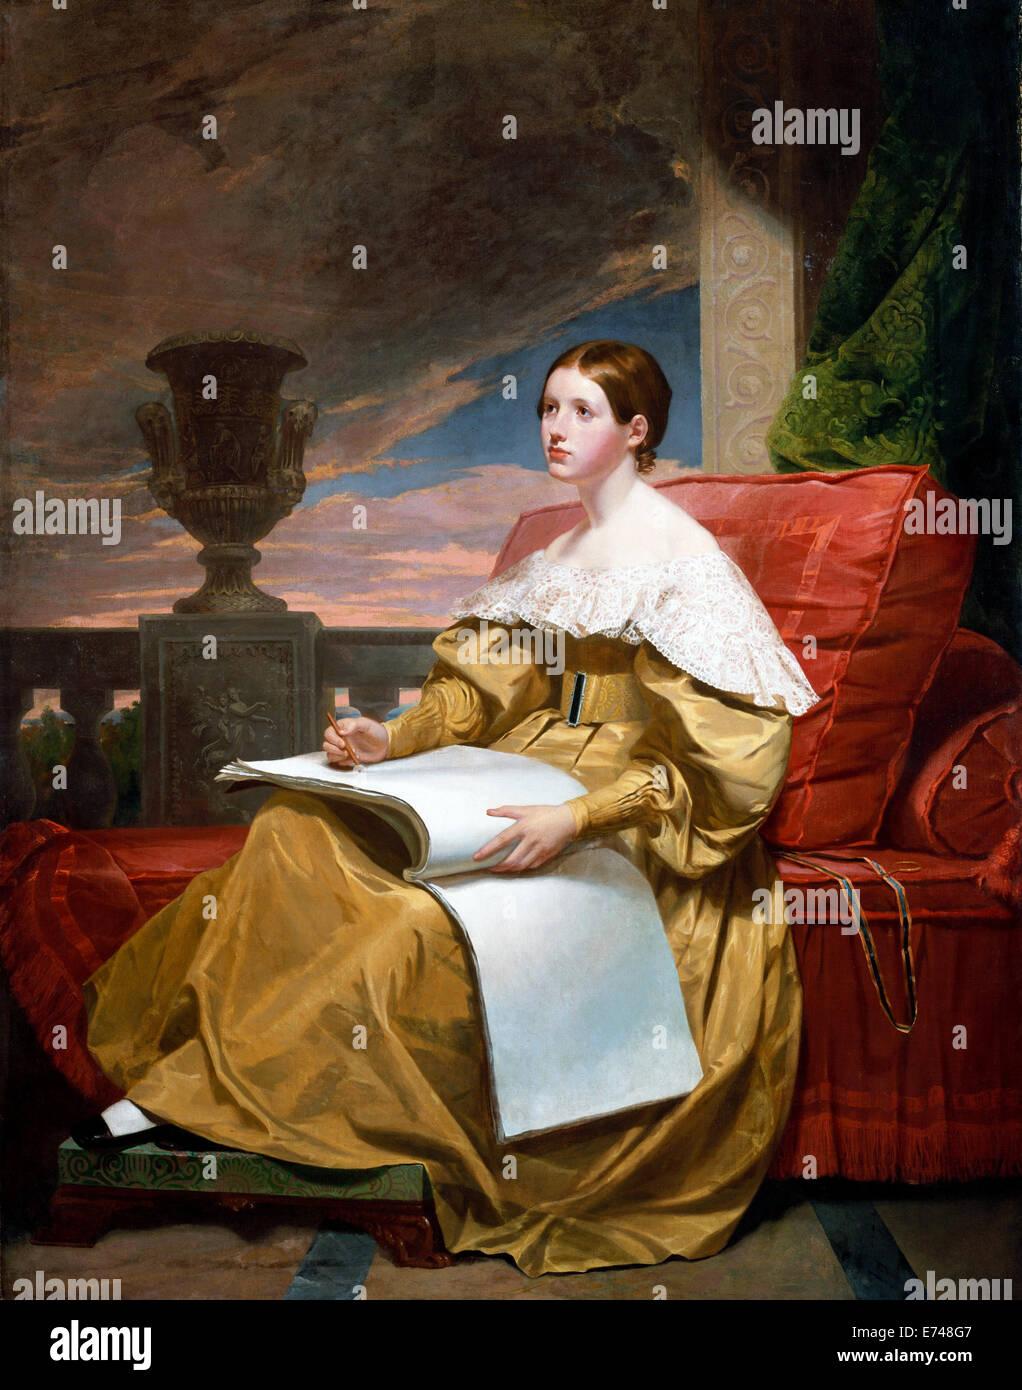 Susan Walker Morse, The Muse - by Samuel F. B. Morse, 1836 - Stock Image